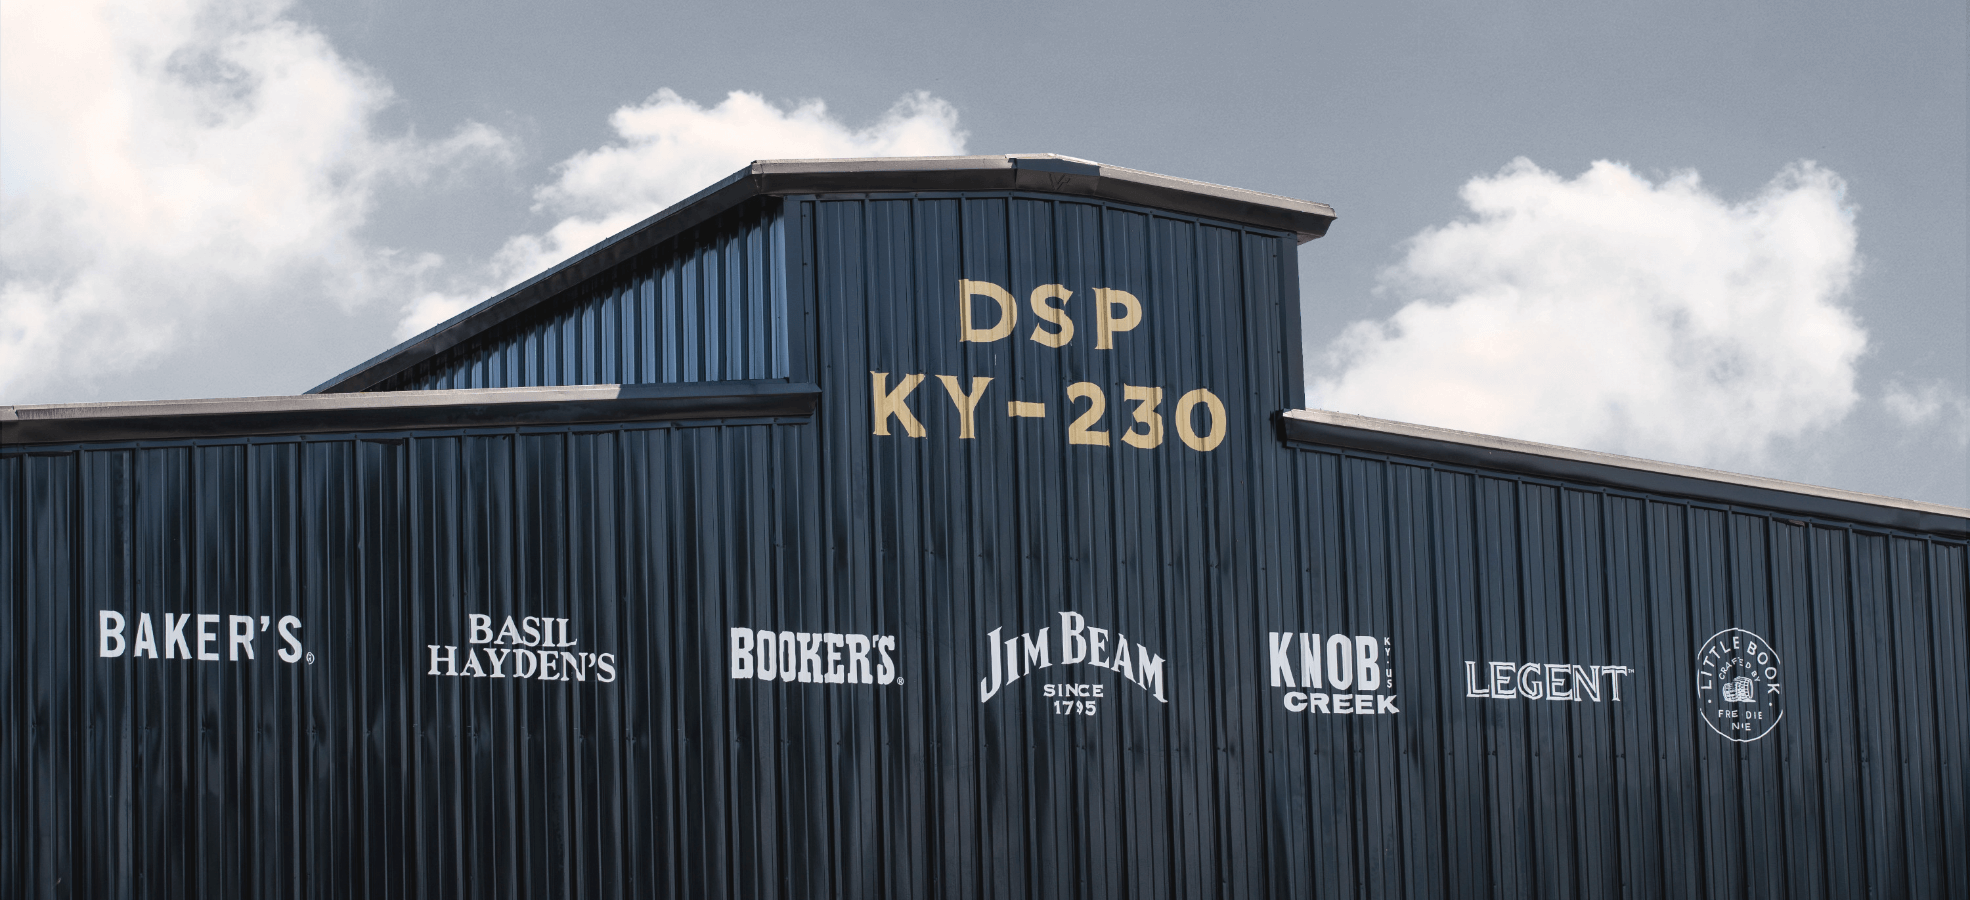 James B. Beam Distilling Co in Kentucky